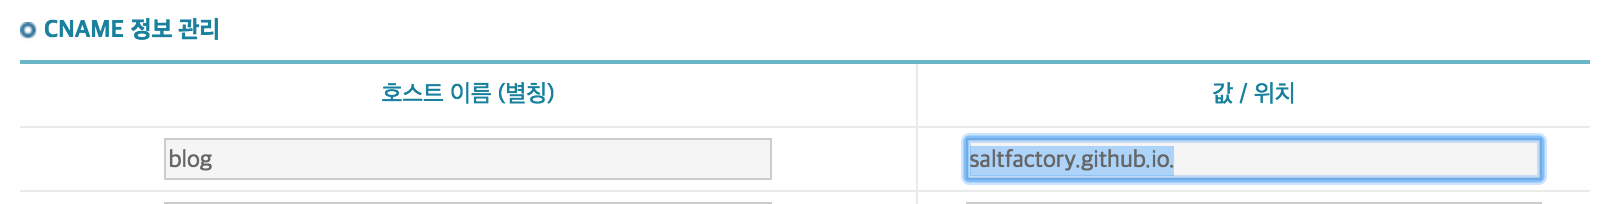 DNS 서버 CNAME